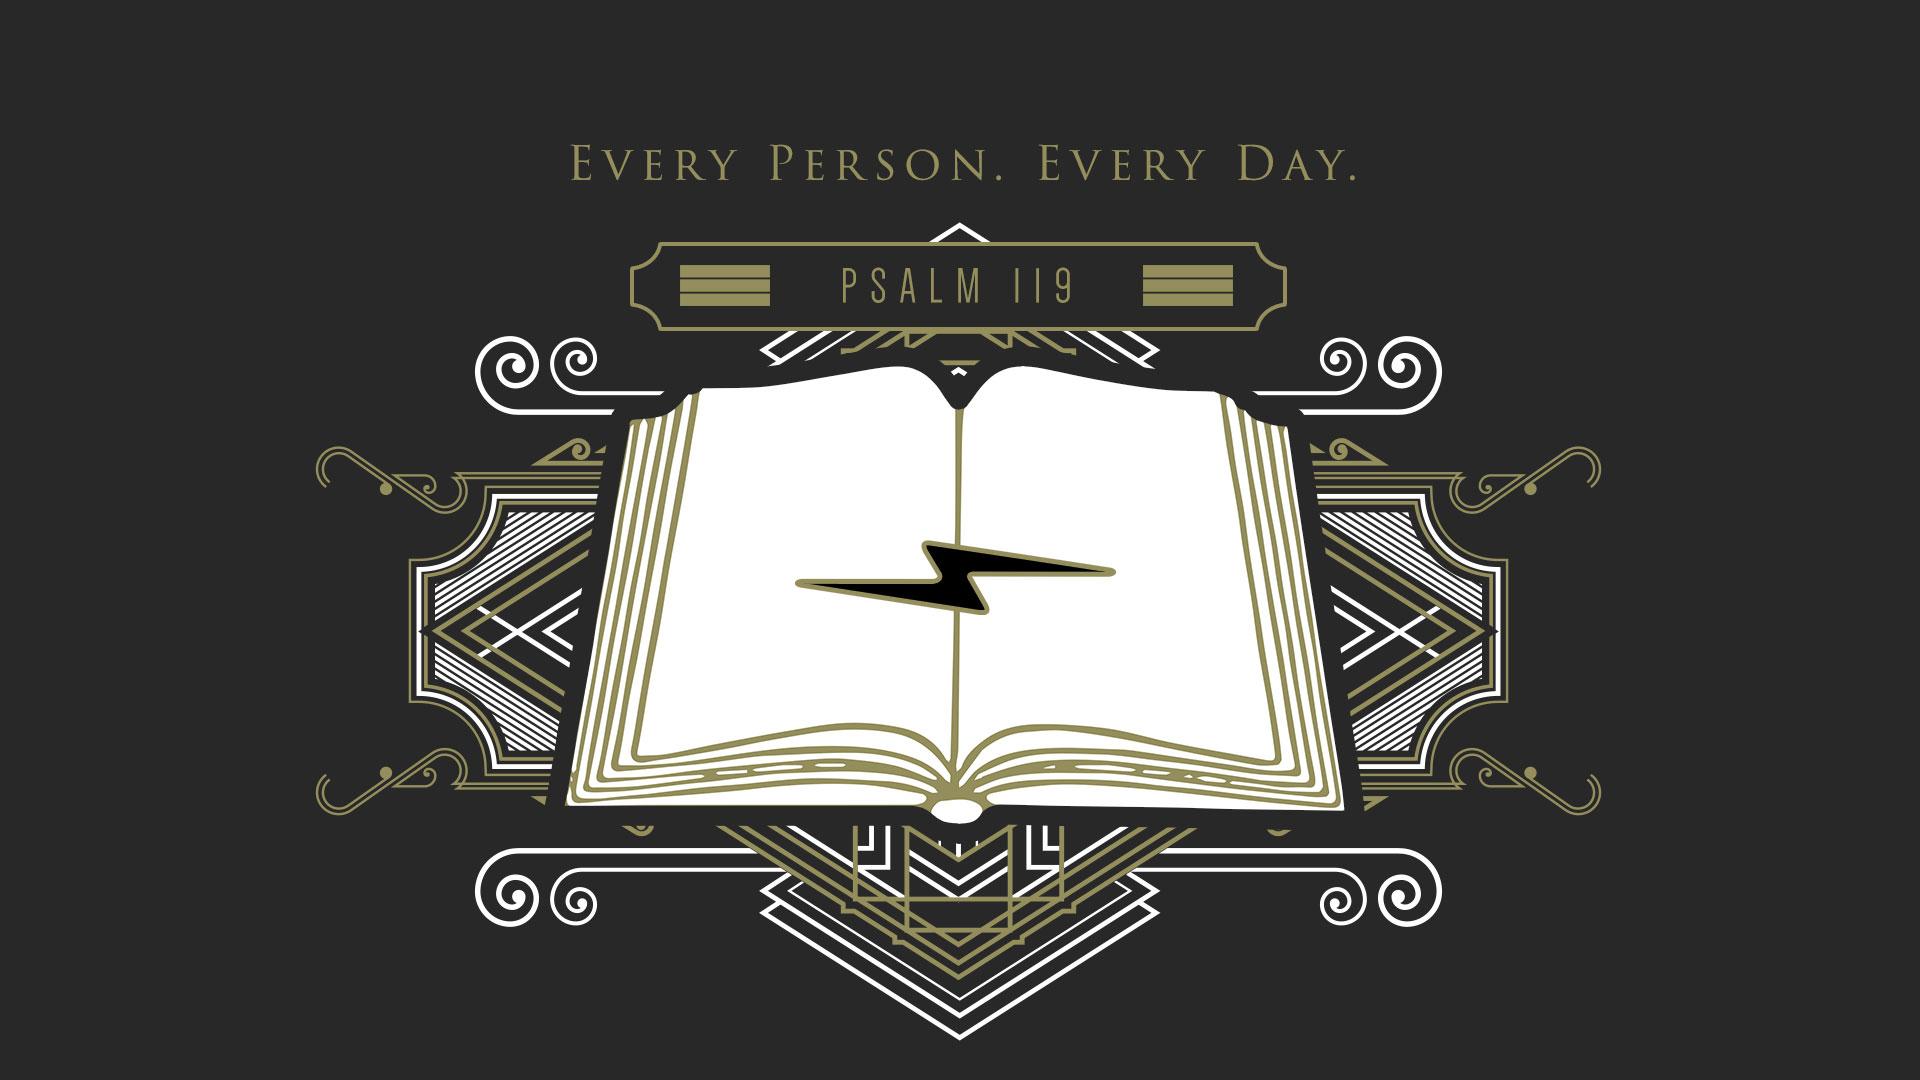 EveryPersonEveryDay.jpg